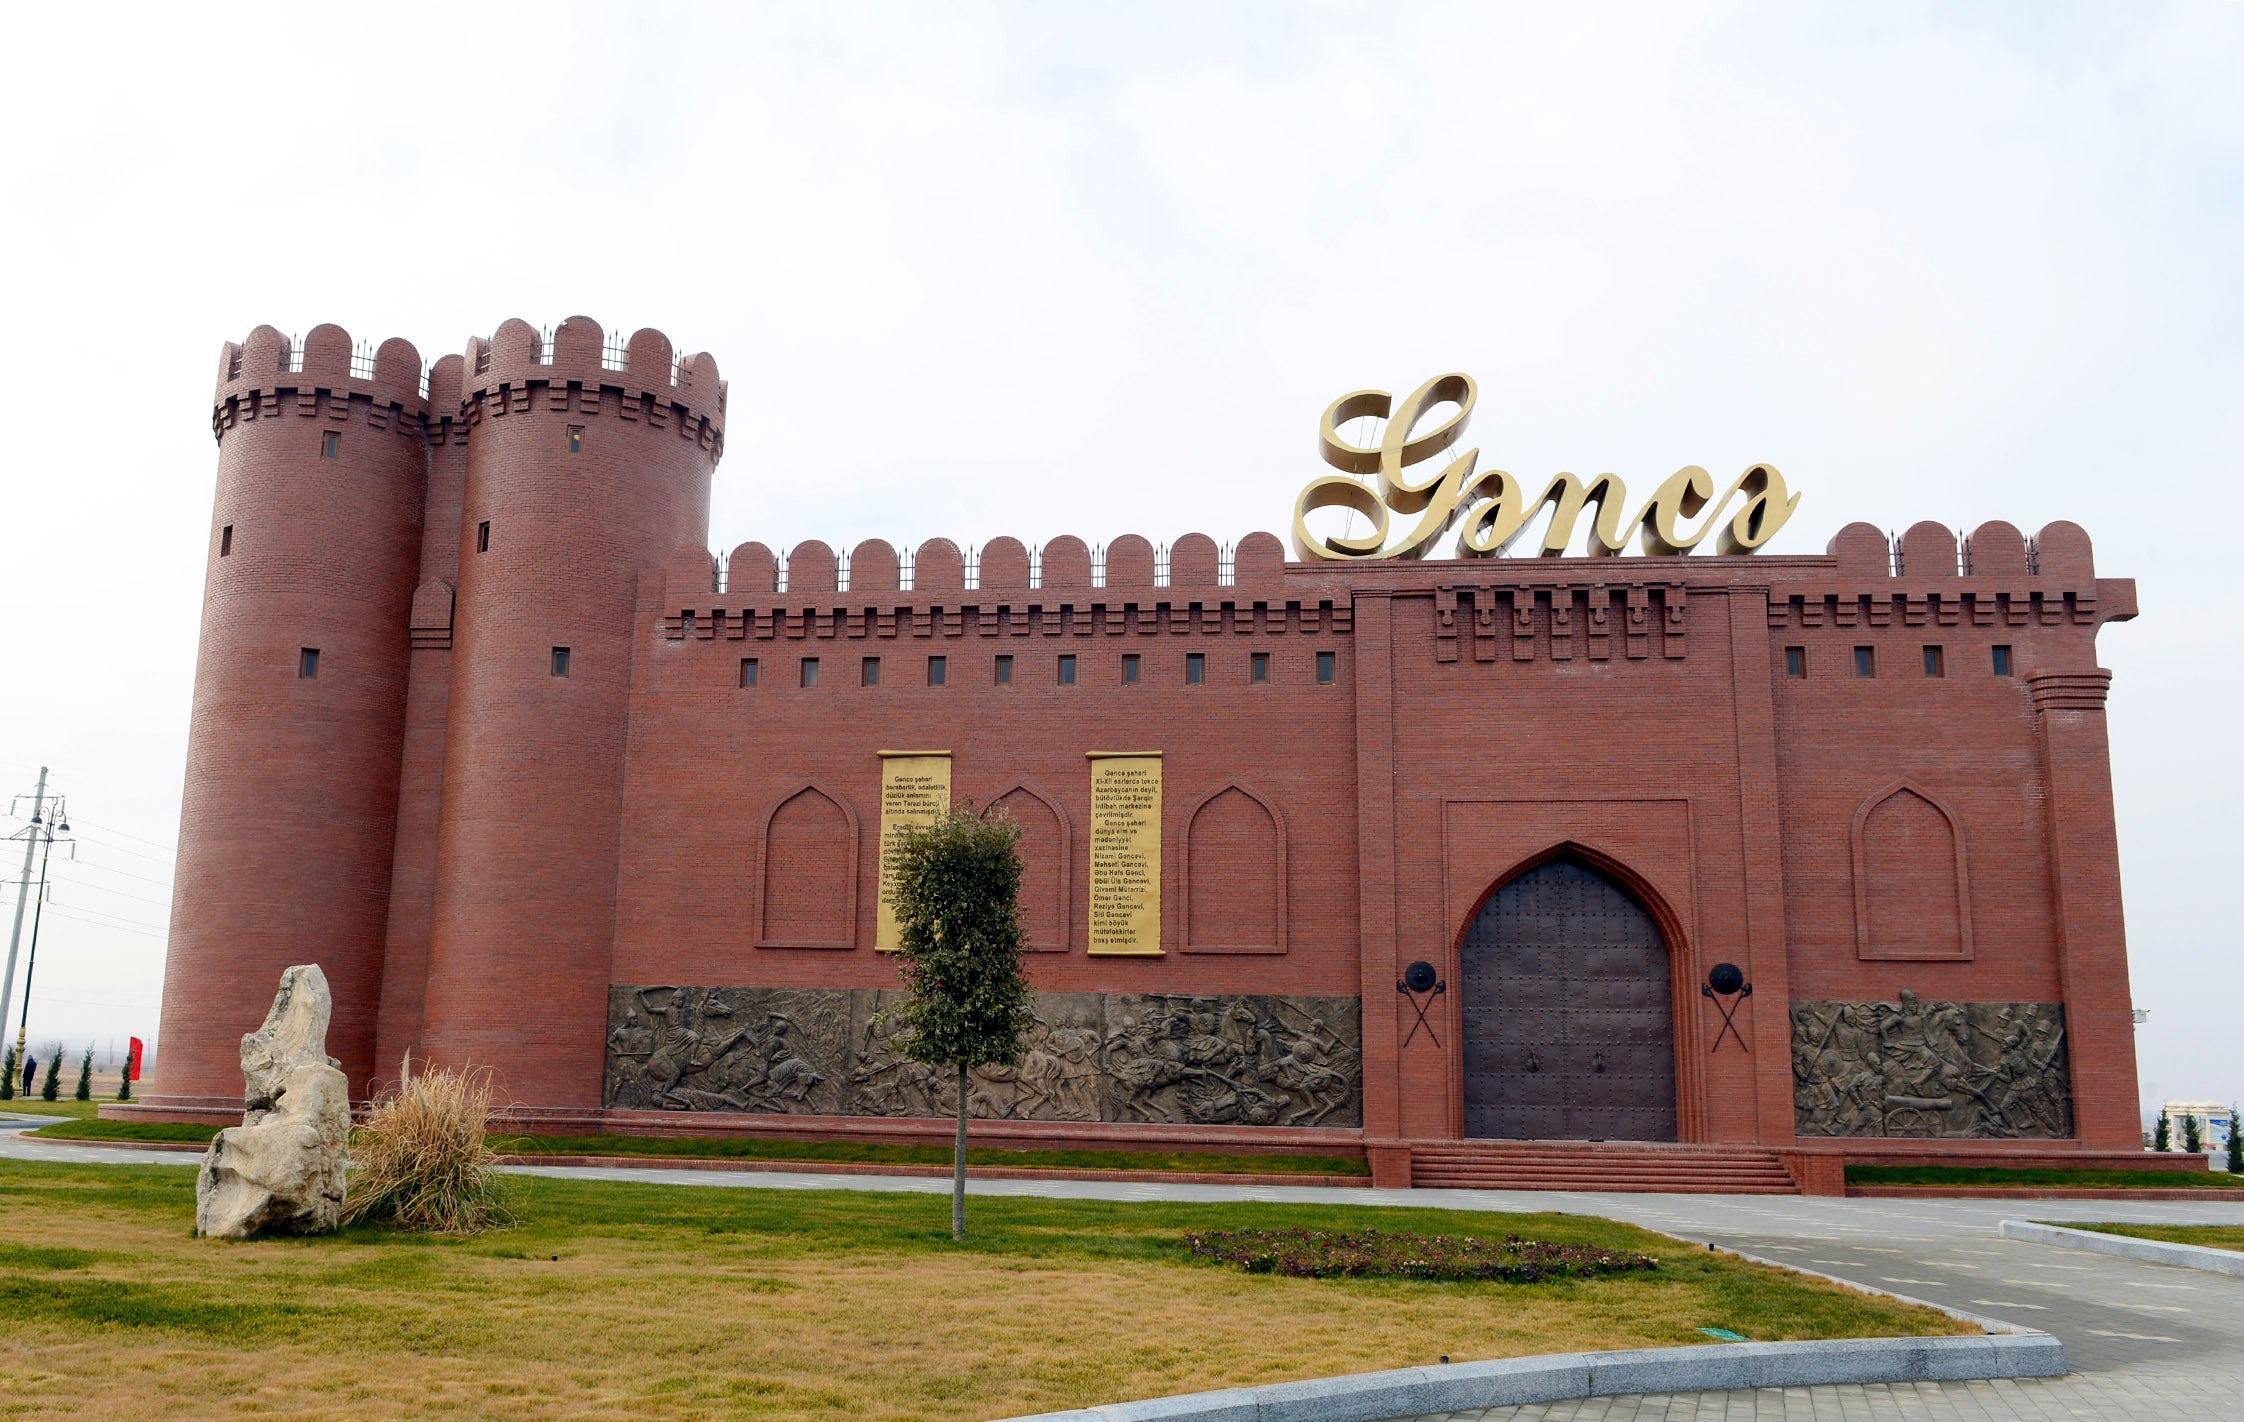 A city made of bricks – Ganja